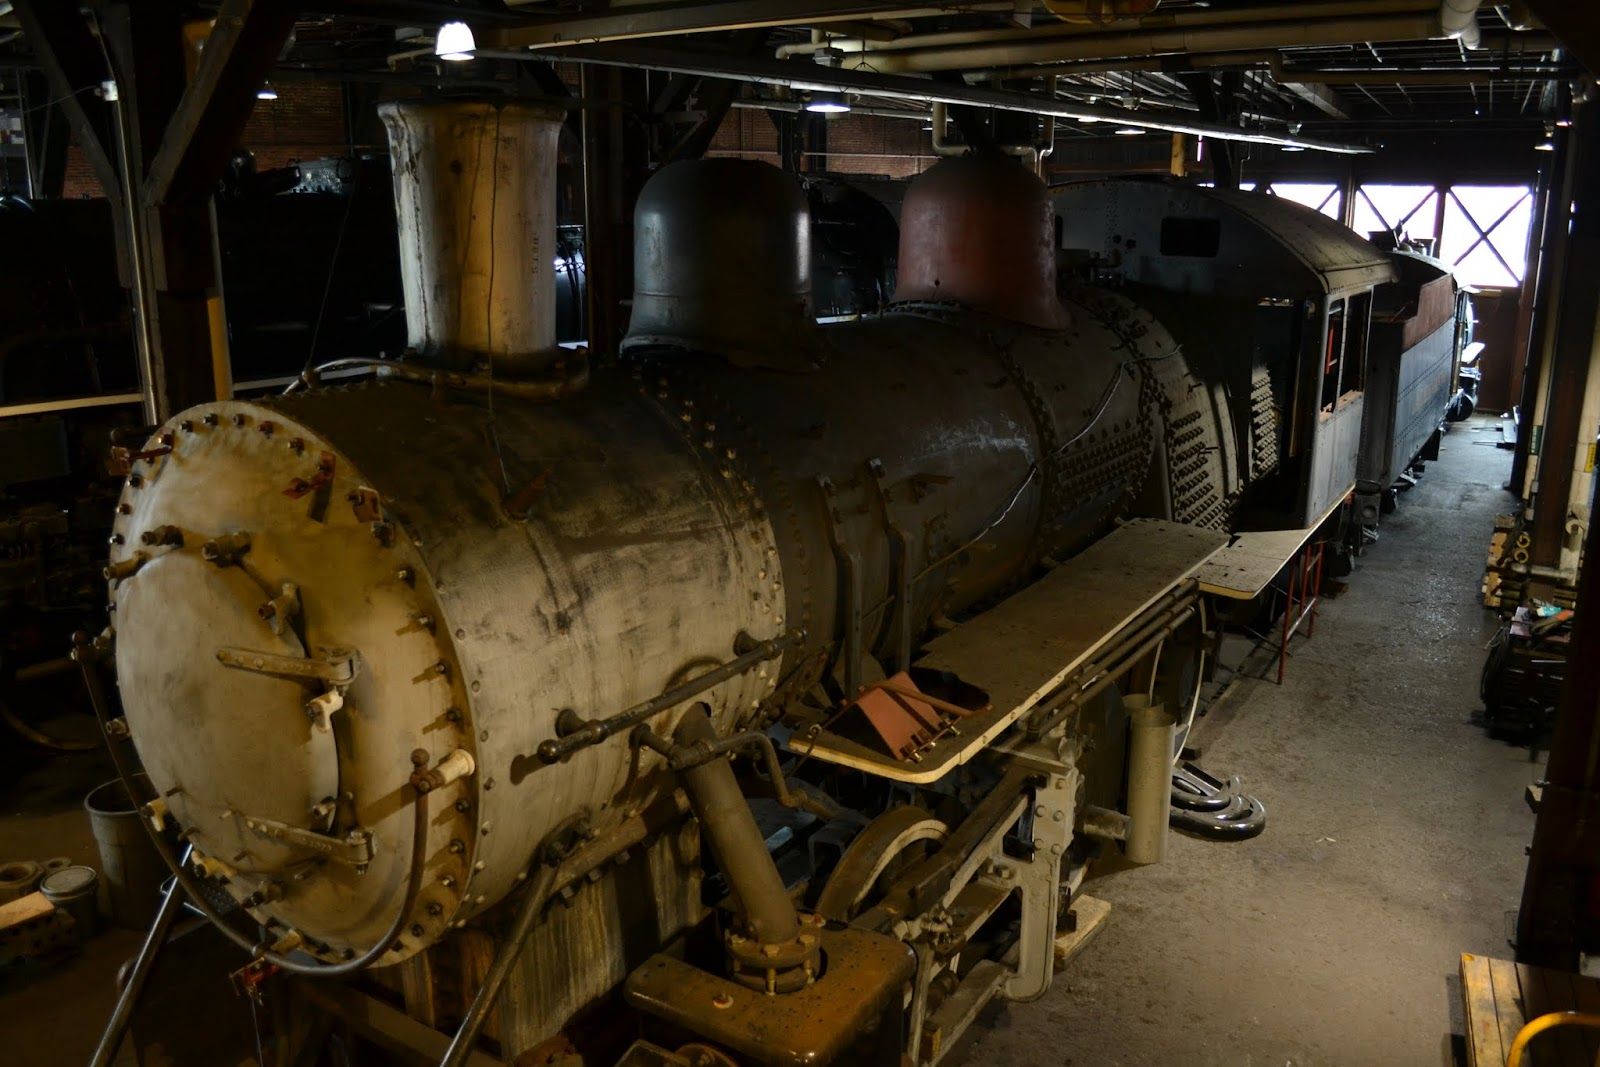 Стимтаун - музей паровозов, Скрэнтон, Пенсильвания(Steamtown National Historic Site, Scranton, PA)